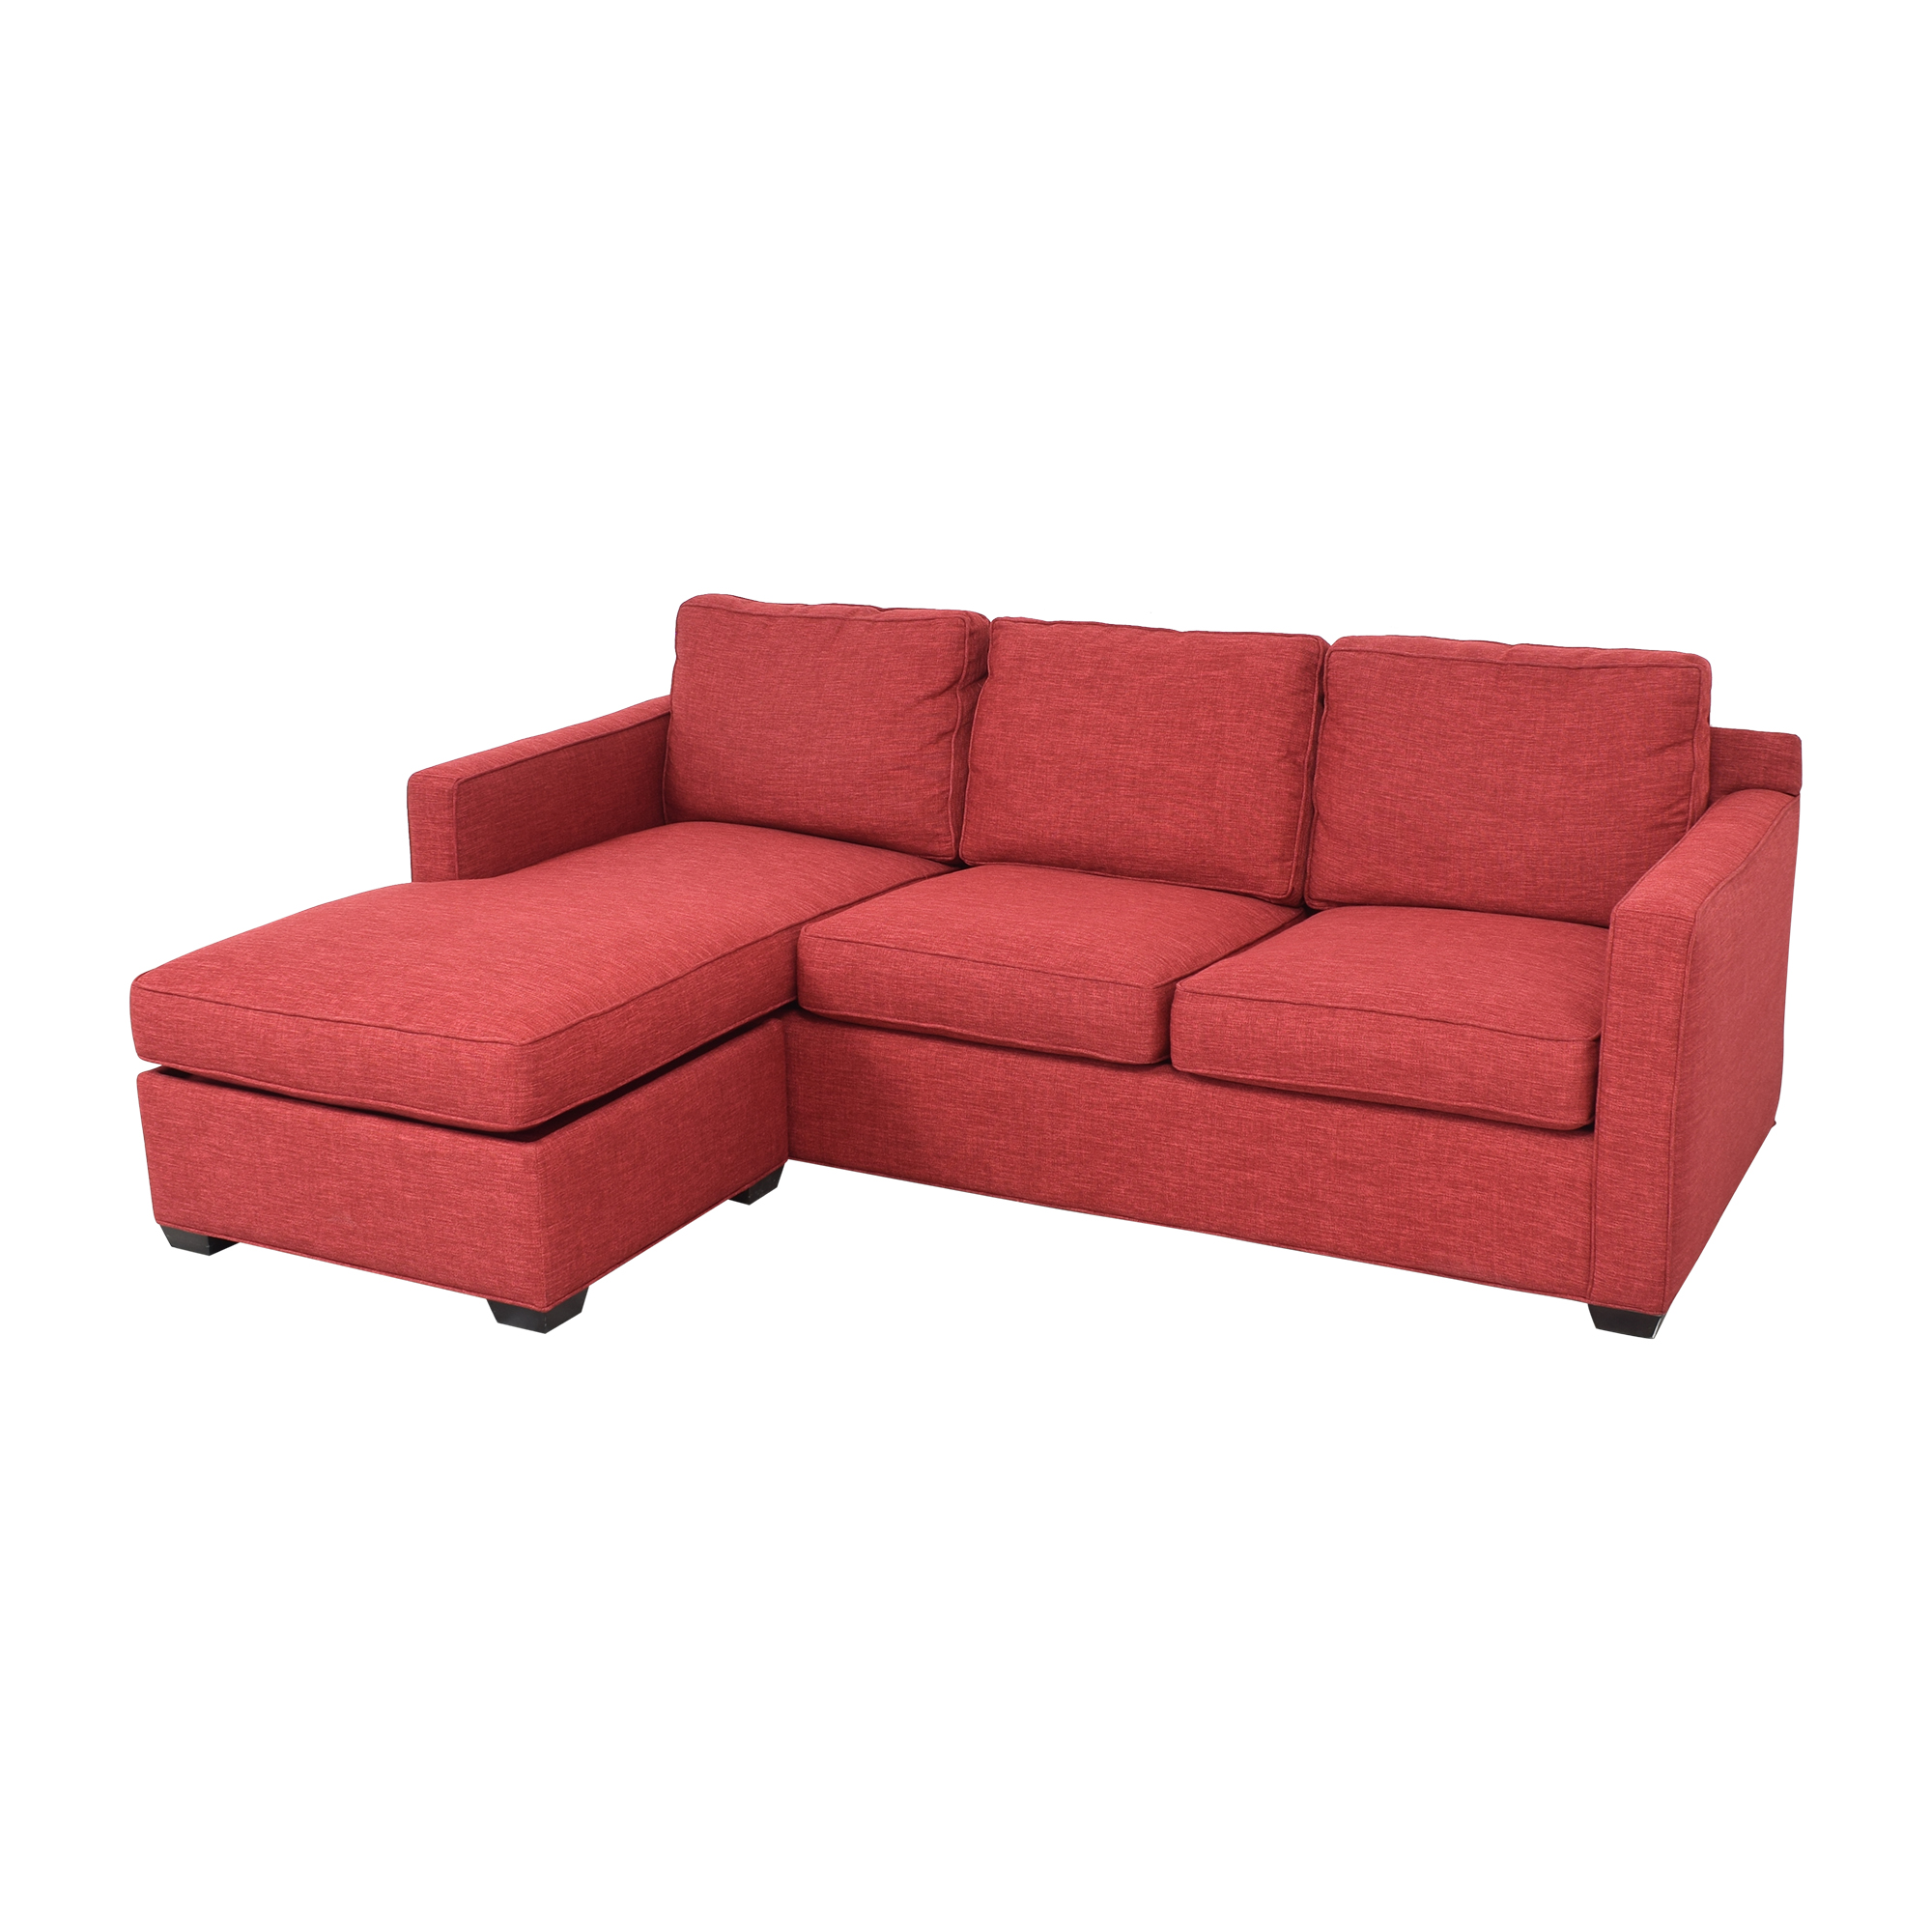 Crate & Barrel Davis 3-Seat Lounger Sofa / Sectionals